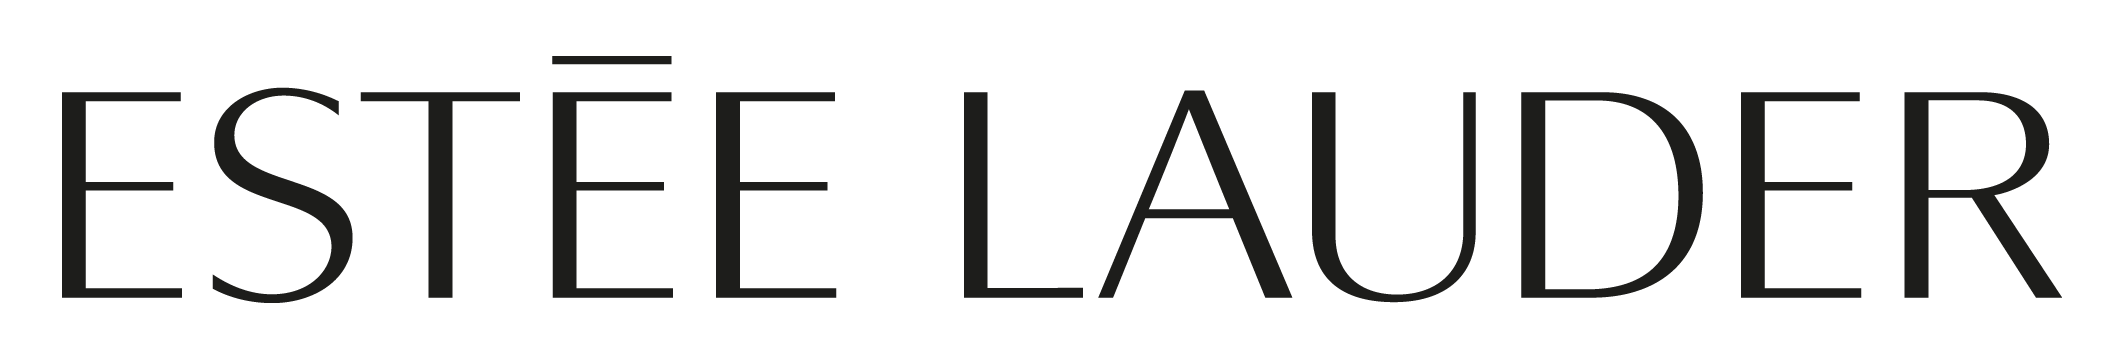 Estee Lauder Logo PNG Image